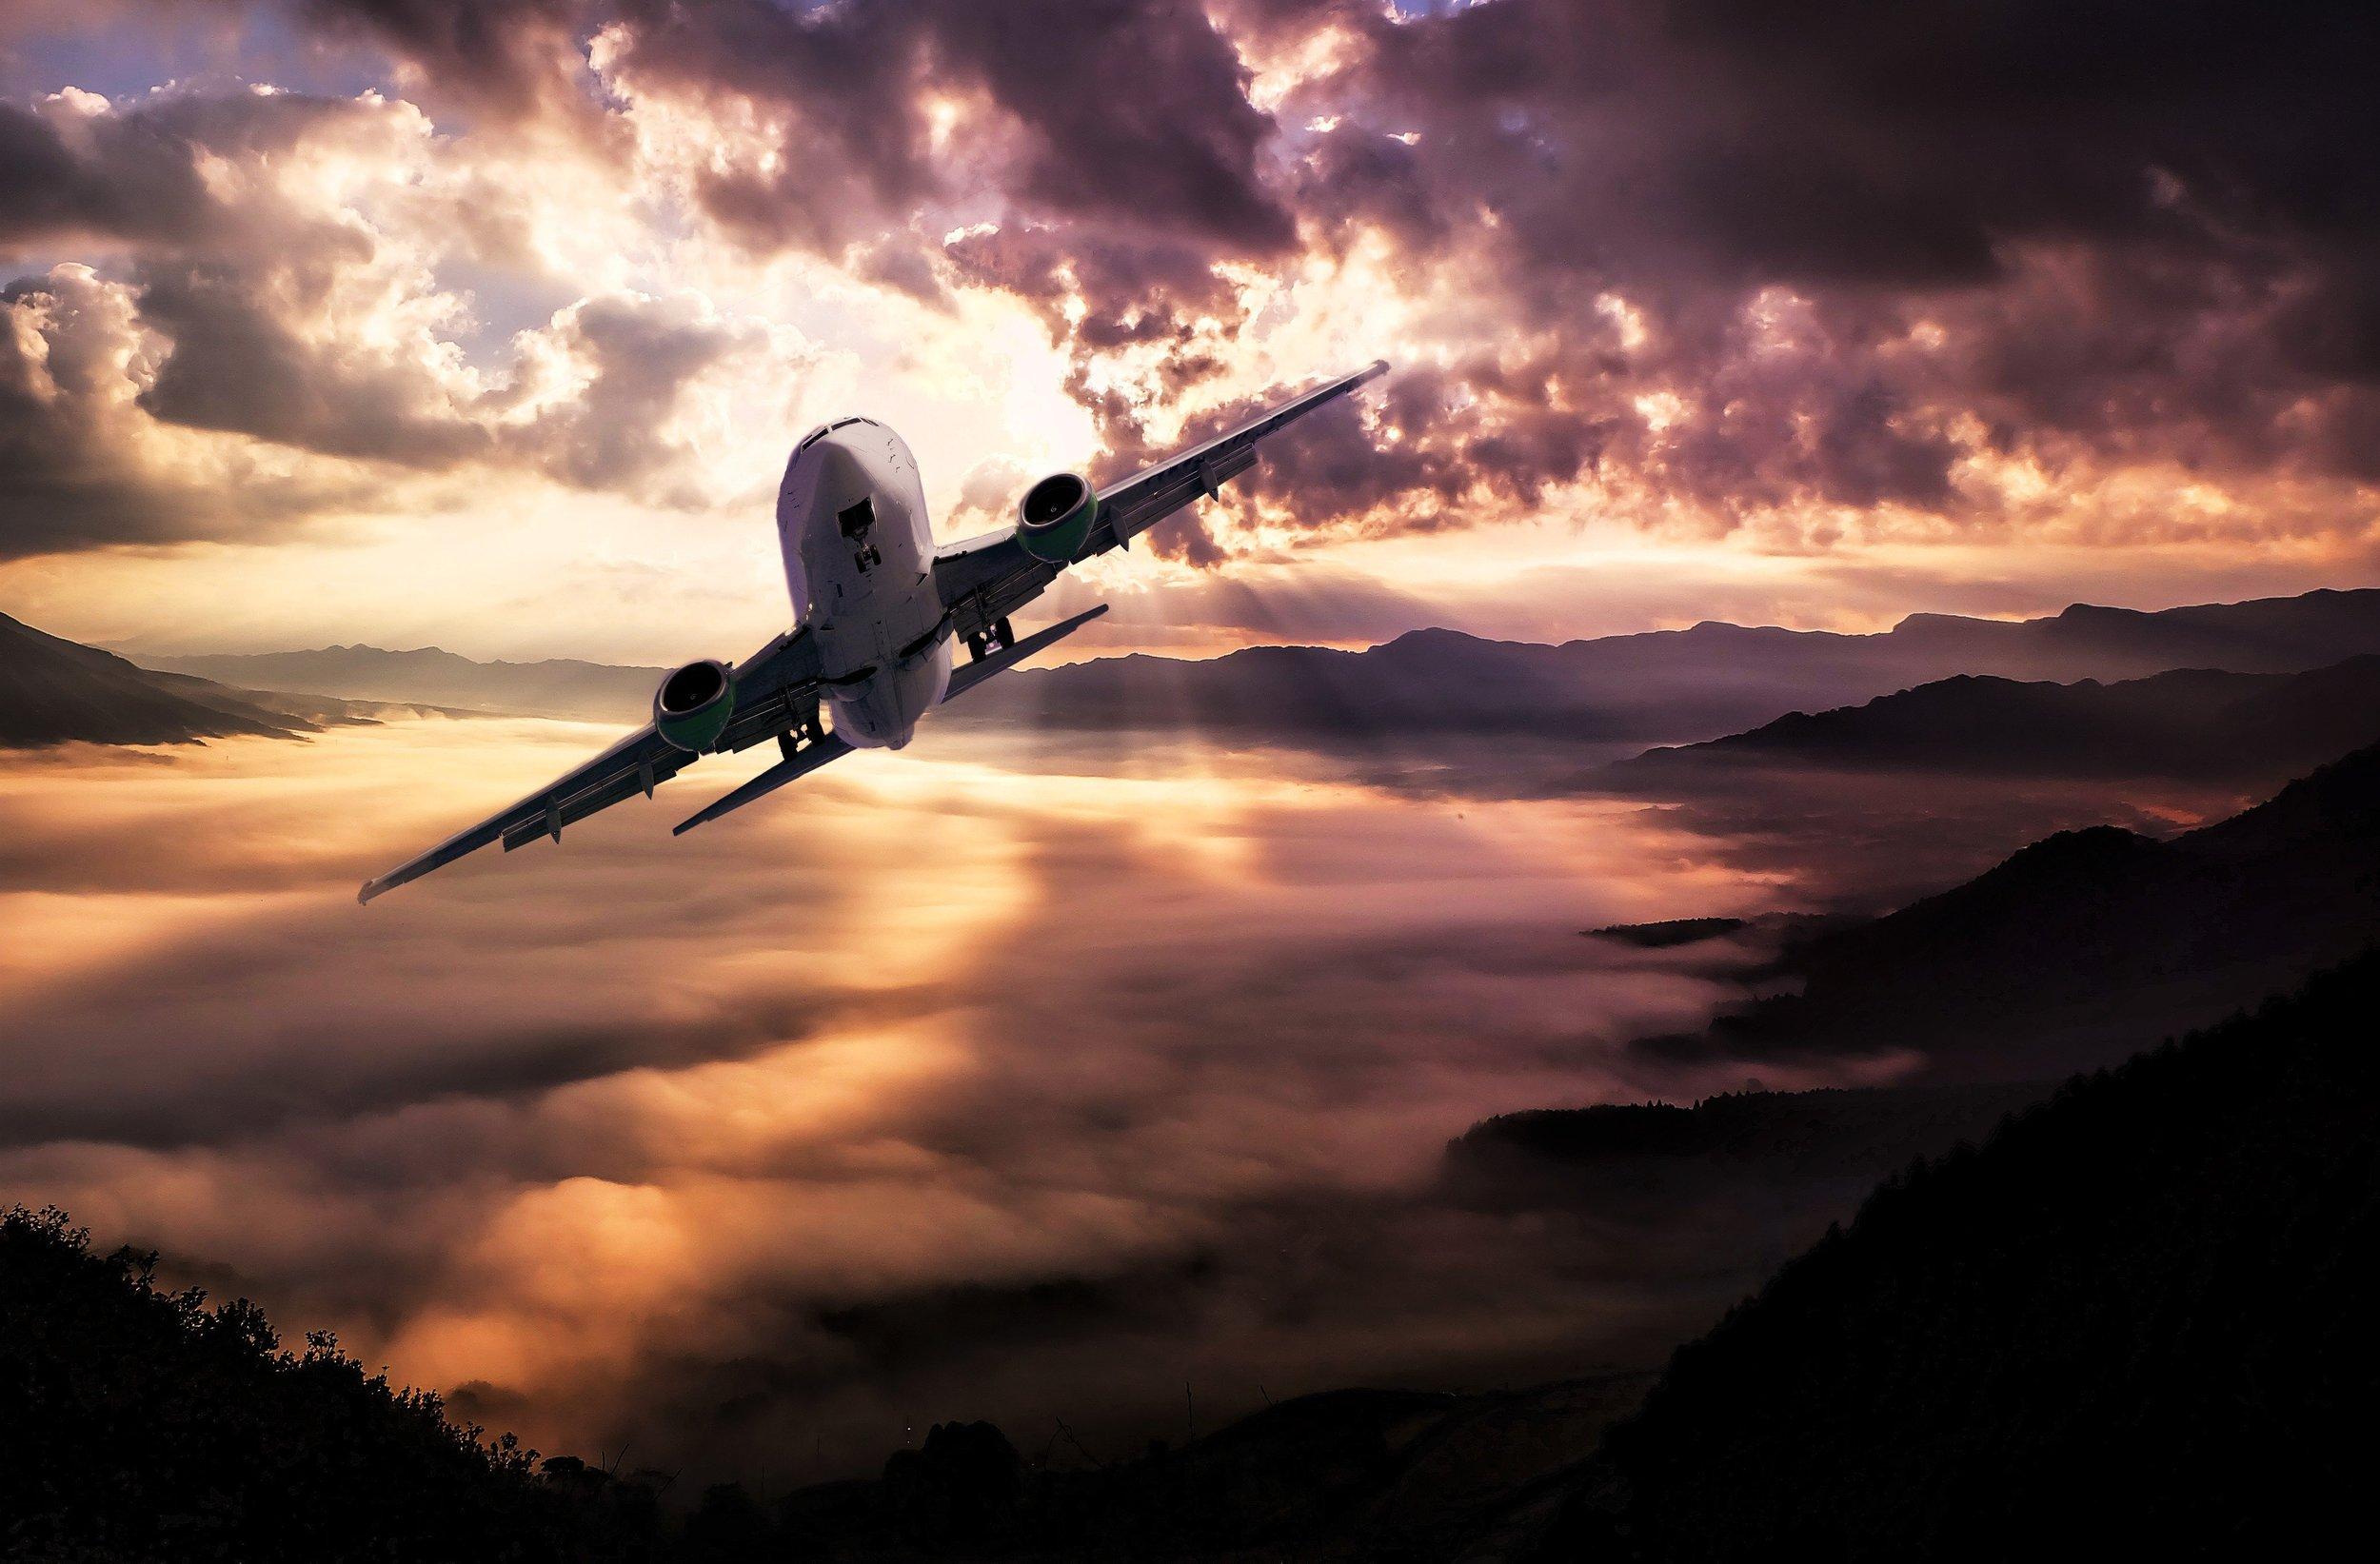 aeroplane-aircraft-airplane-38574.jpg